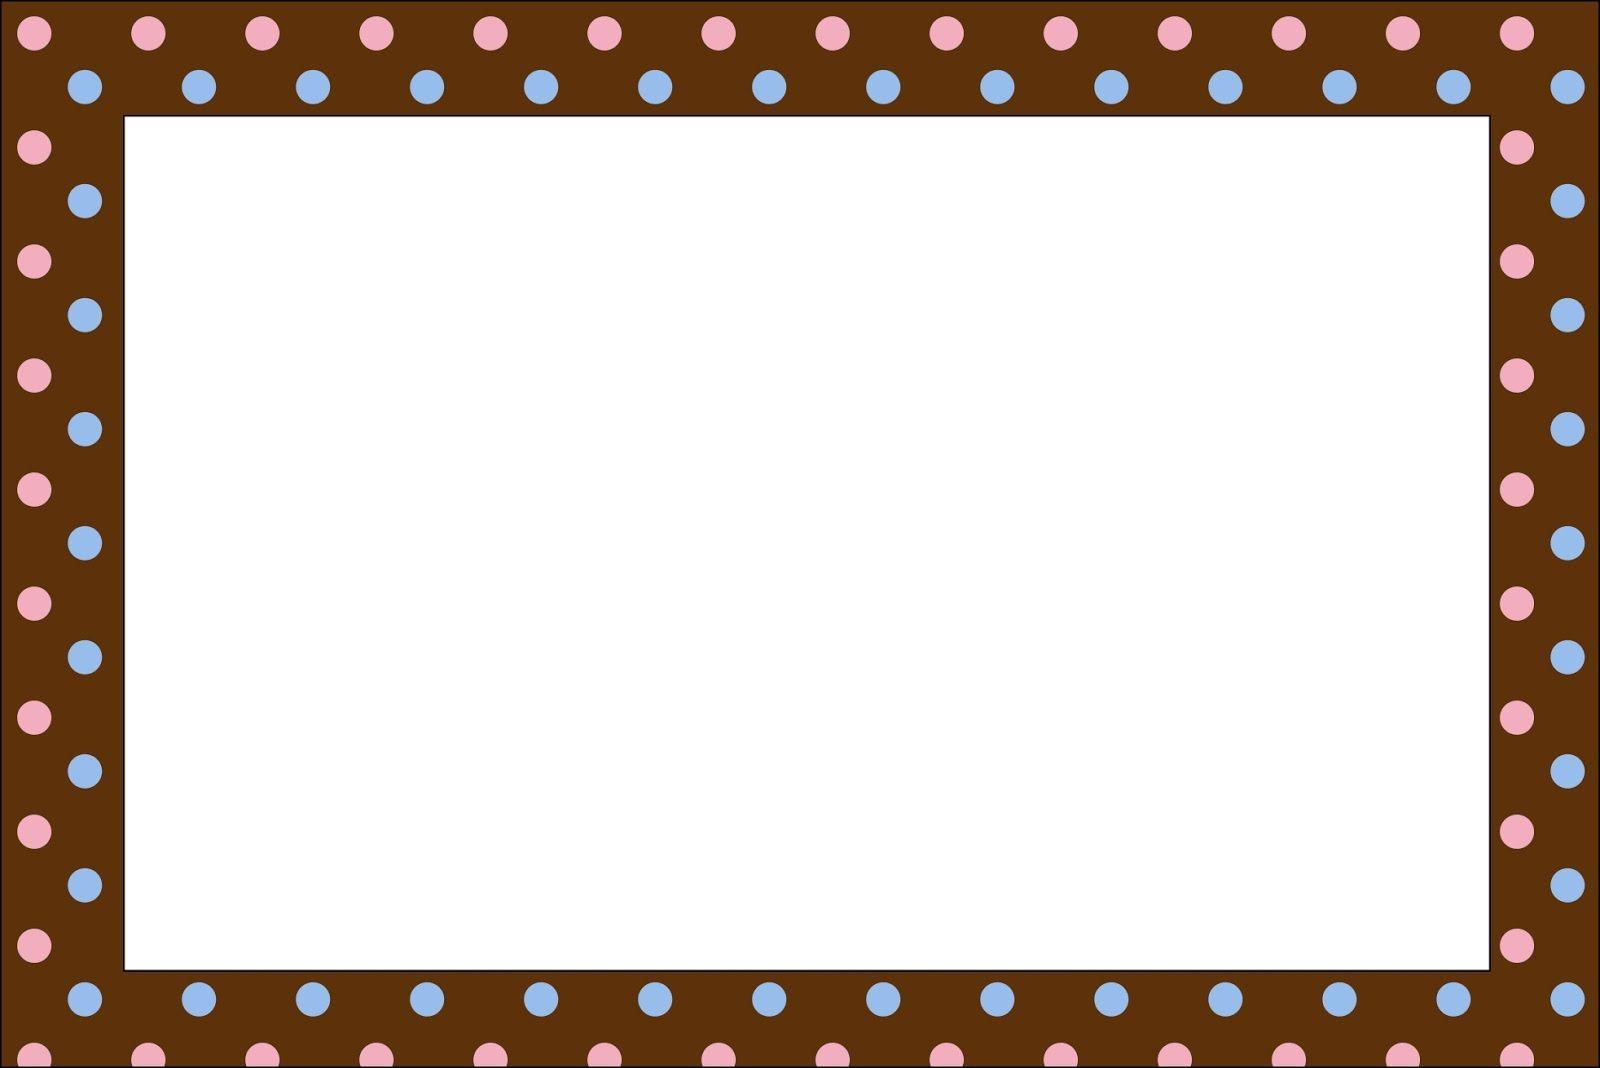 moldura simples para fotos - Pesquisa Google | Marcos | Pinterest ...